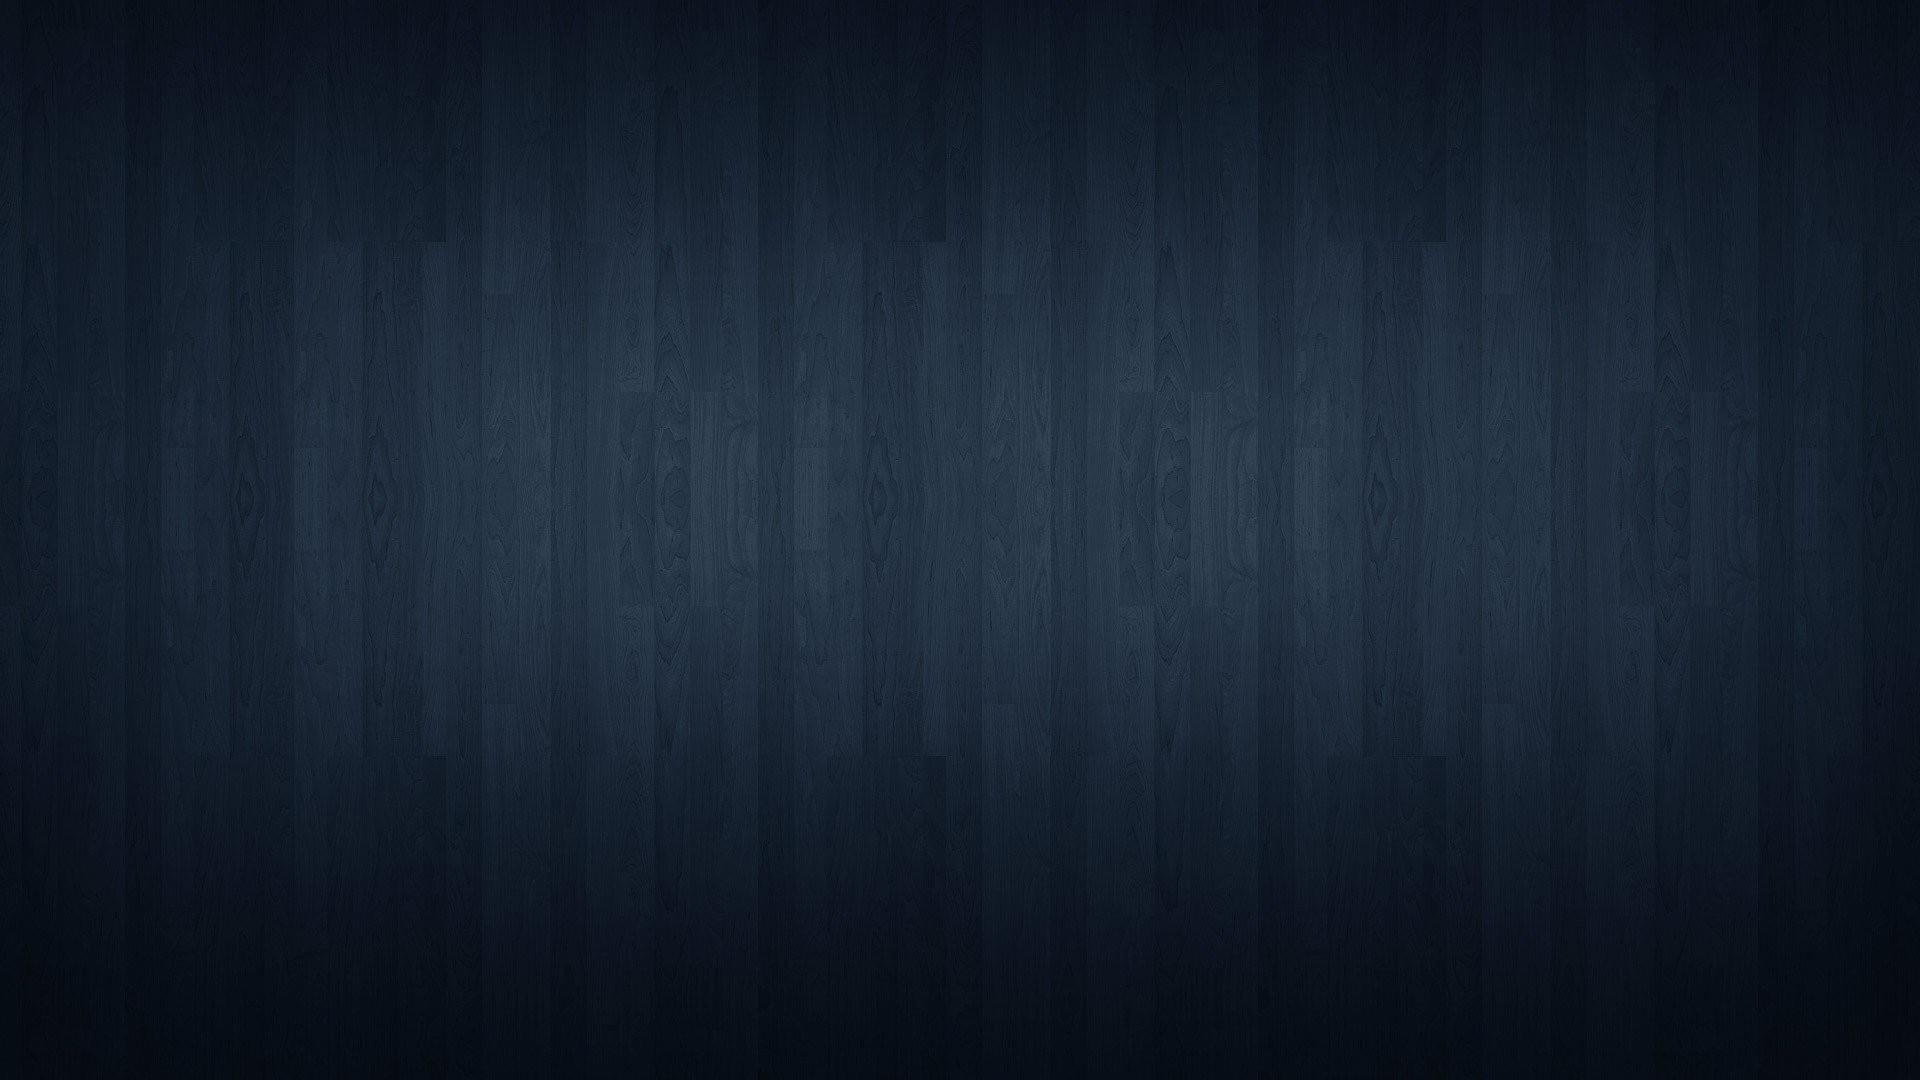 Grey Wood Texture 755435